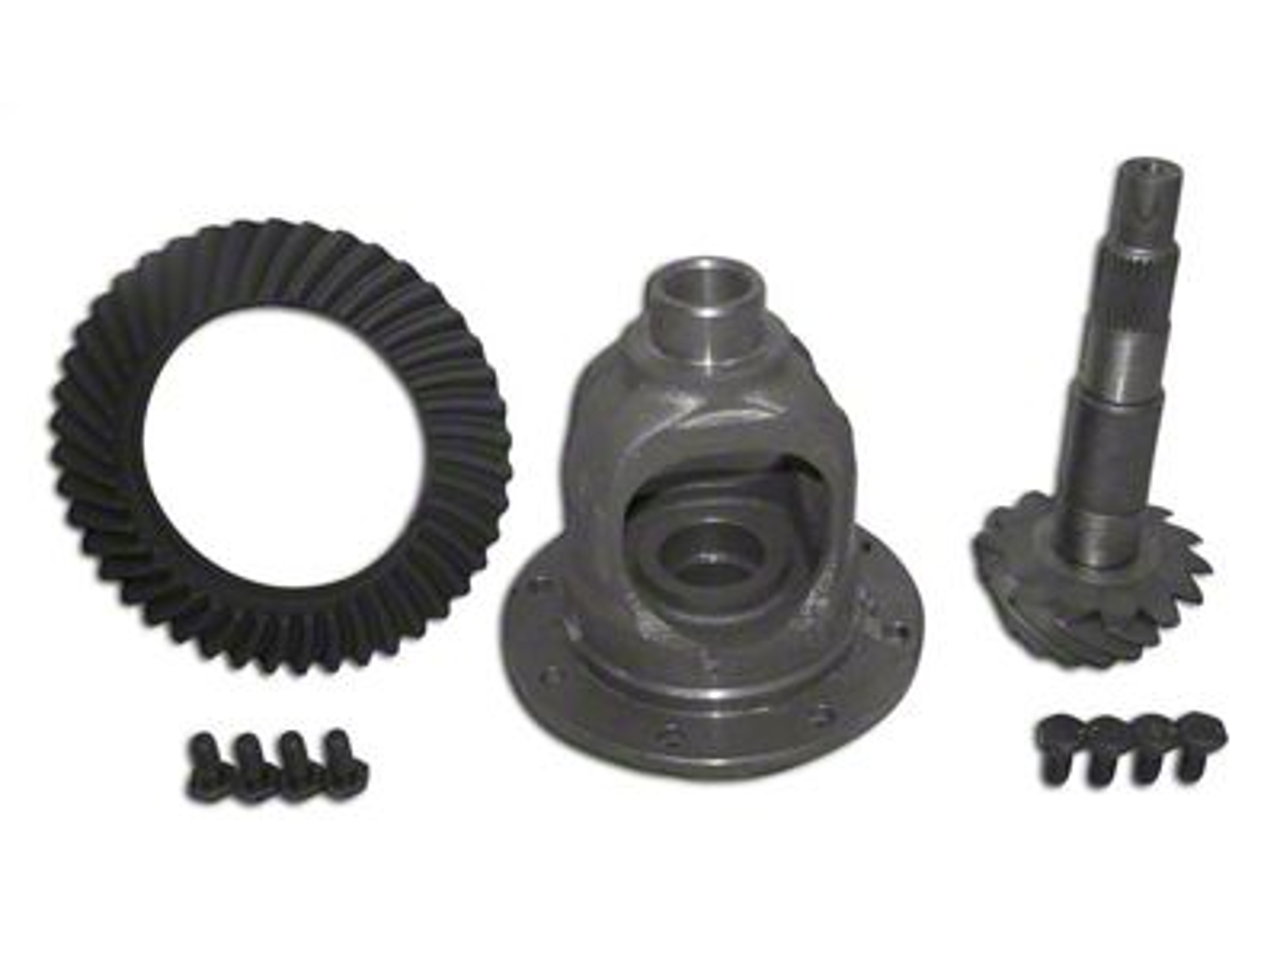 Crown Automotive Dana 35 Rear Ring Gear and Pinion Kit - 3.07 Gears (87-90 Jeep Wrangler YJ)